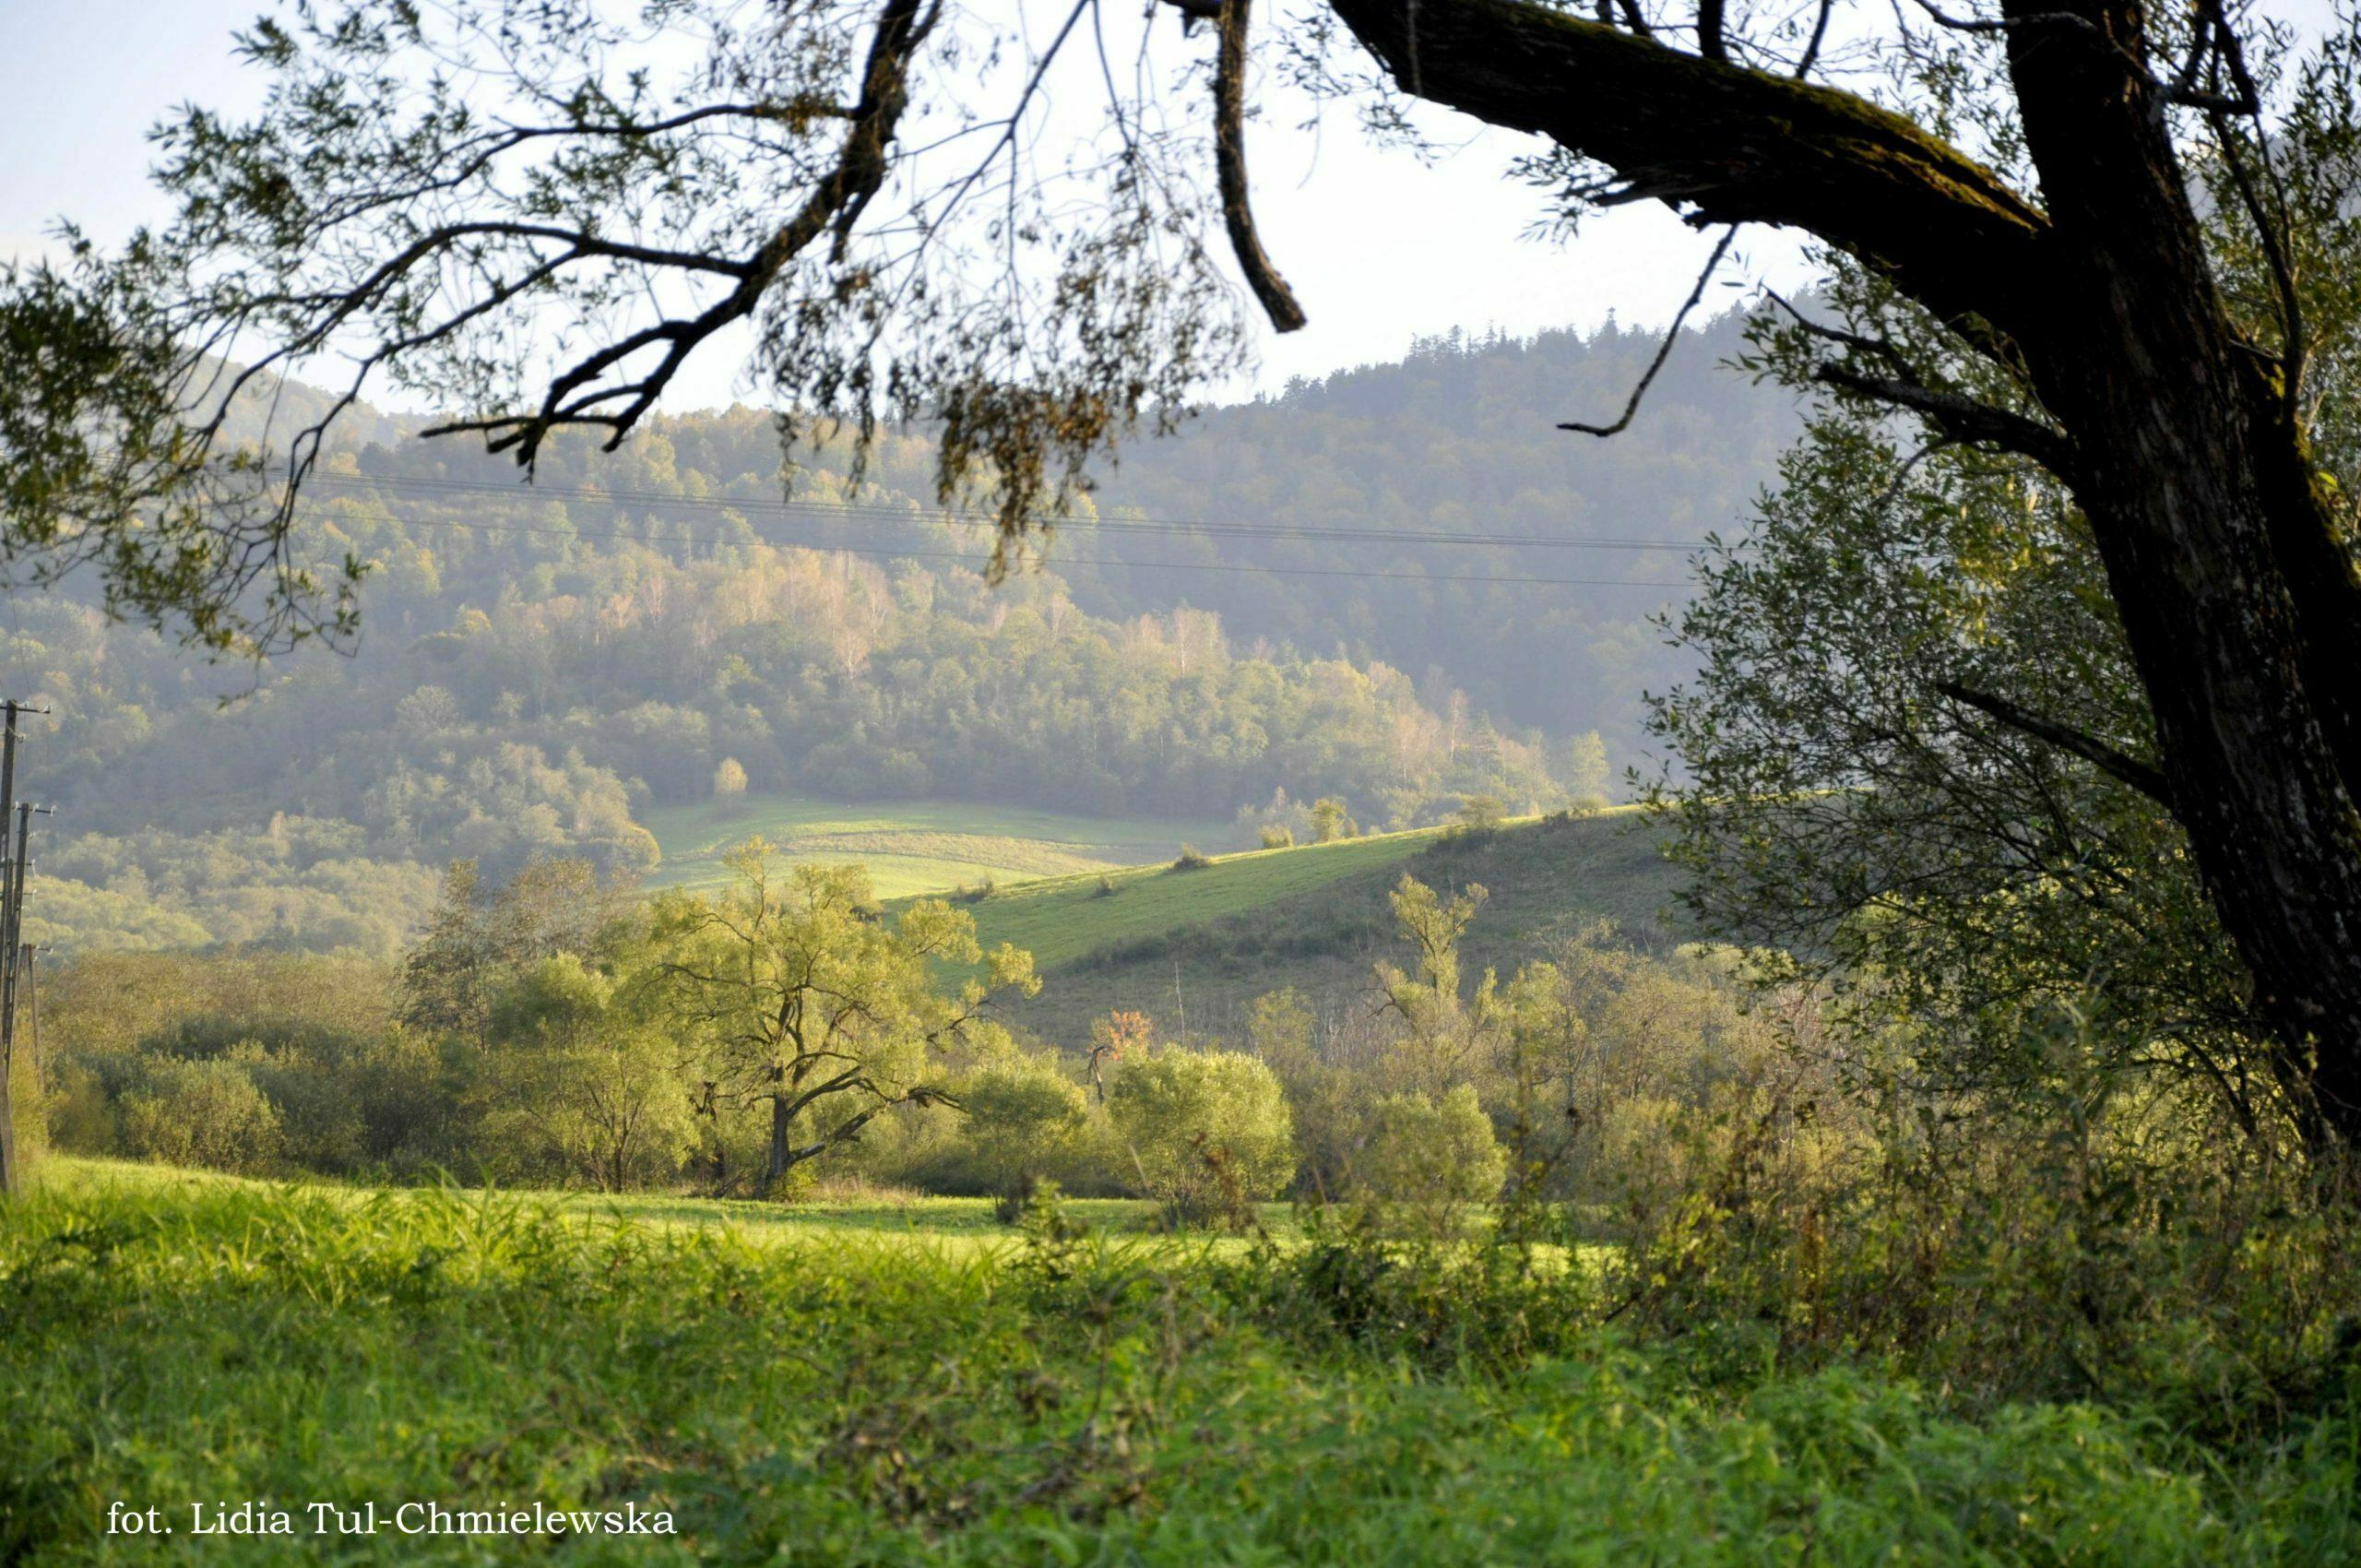 Dolina Krywego fot. Lidia Tul-Chmielewska